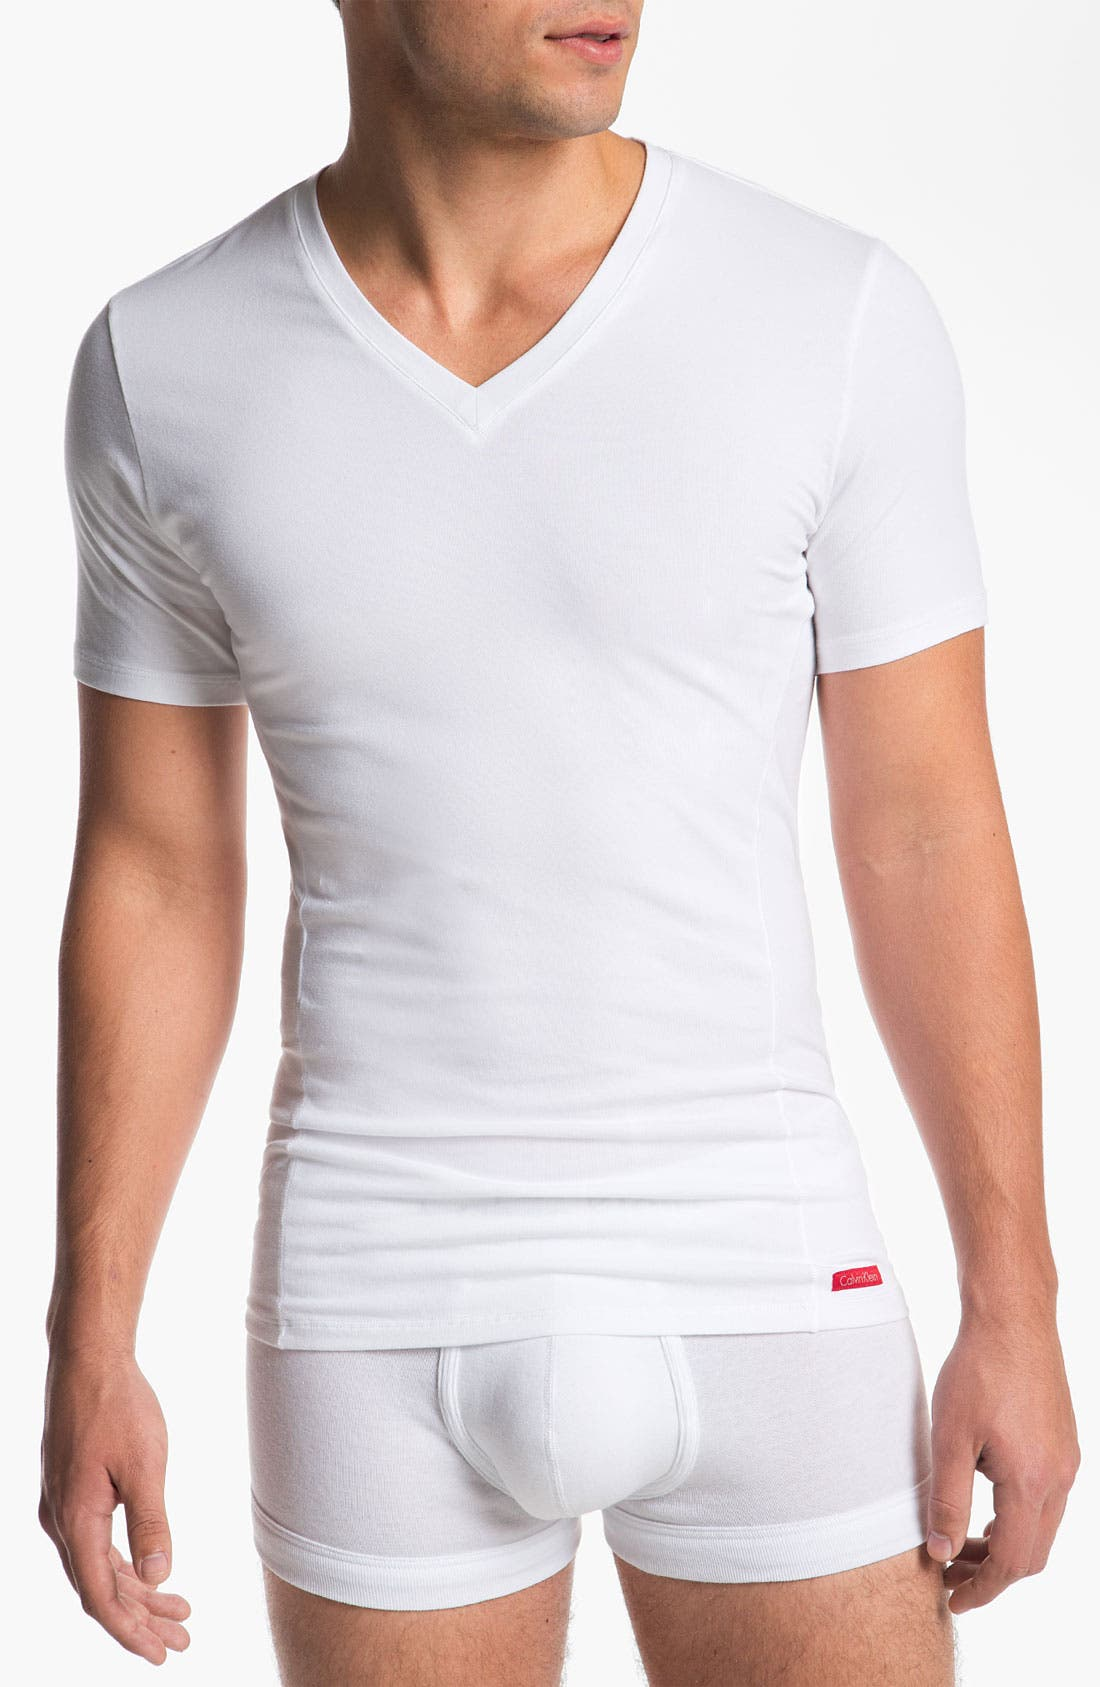 Main Image - Calvin Klein 'Pro Stretch' Slim Fit V-Neck T-Shirt